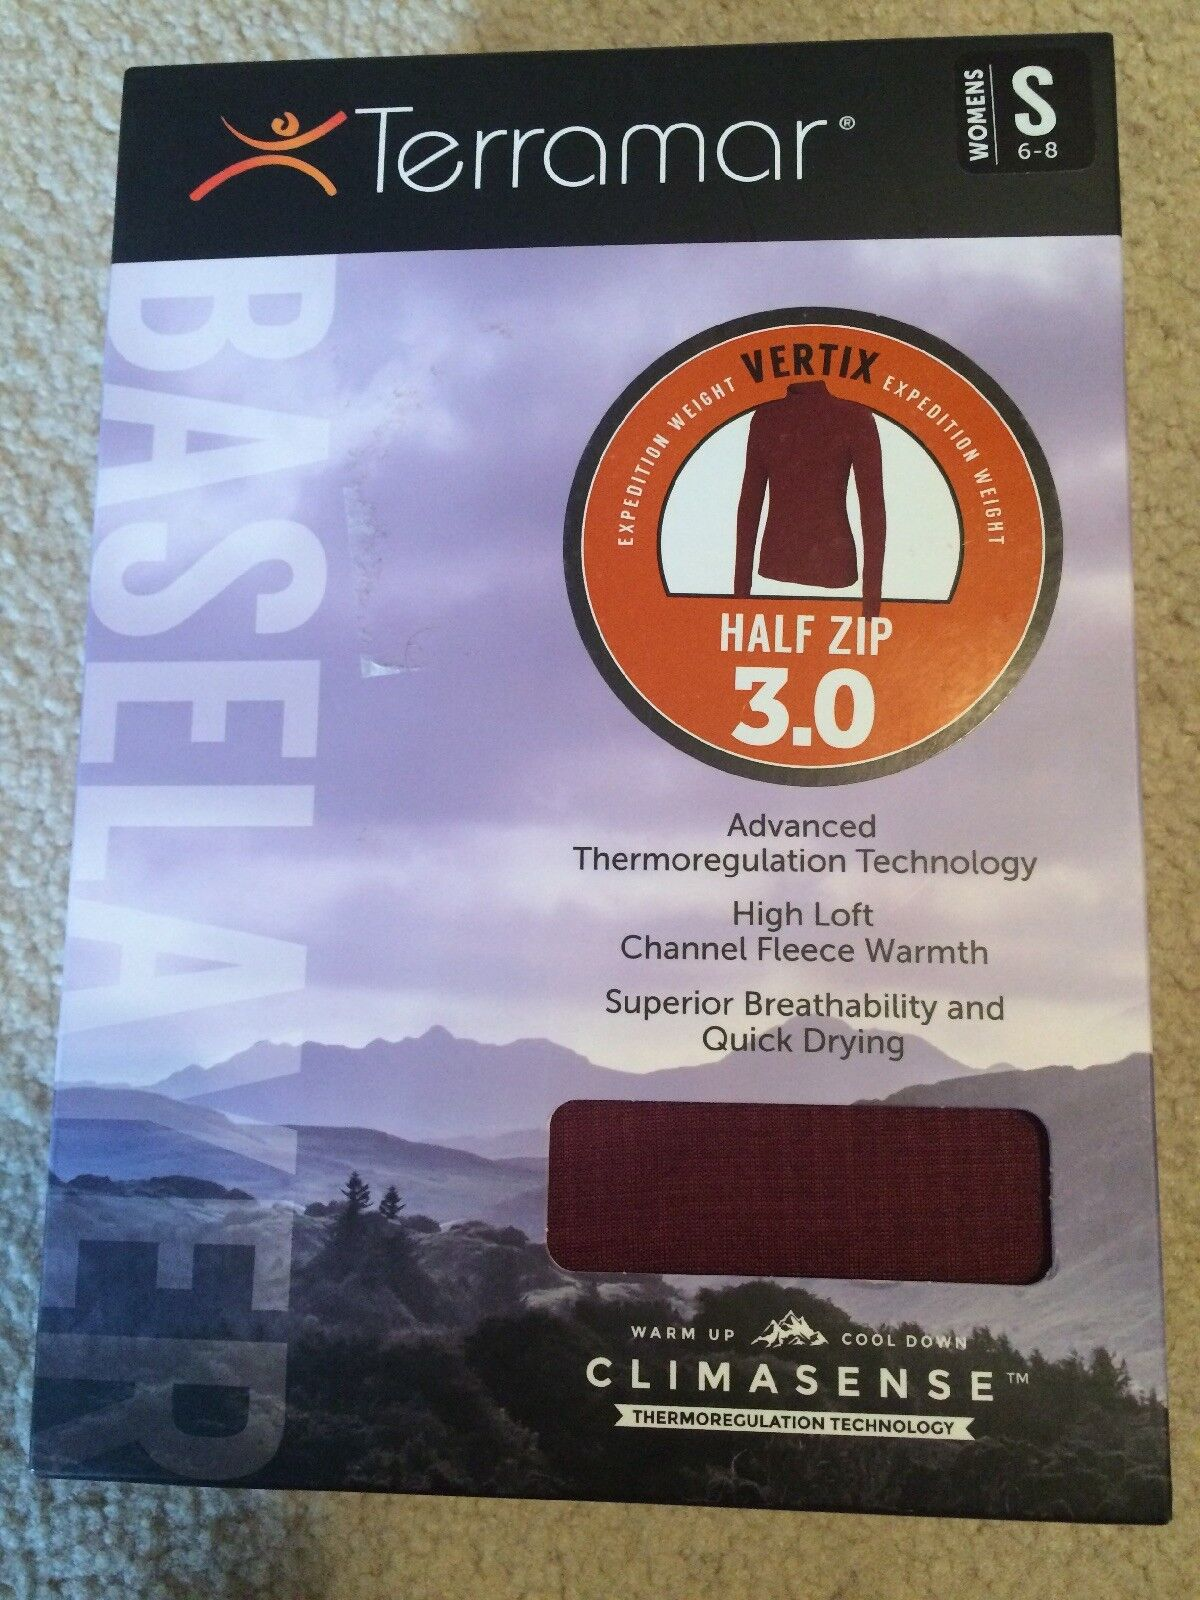 Terramar Womens 3.0 BaseLayer S Merlot greenex Climasense Top Half Zip Long Sleev